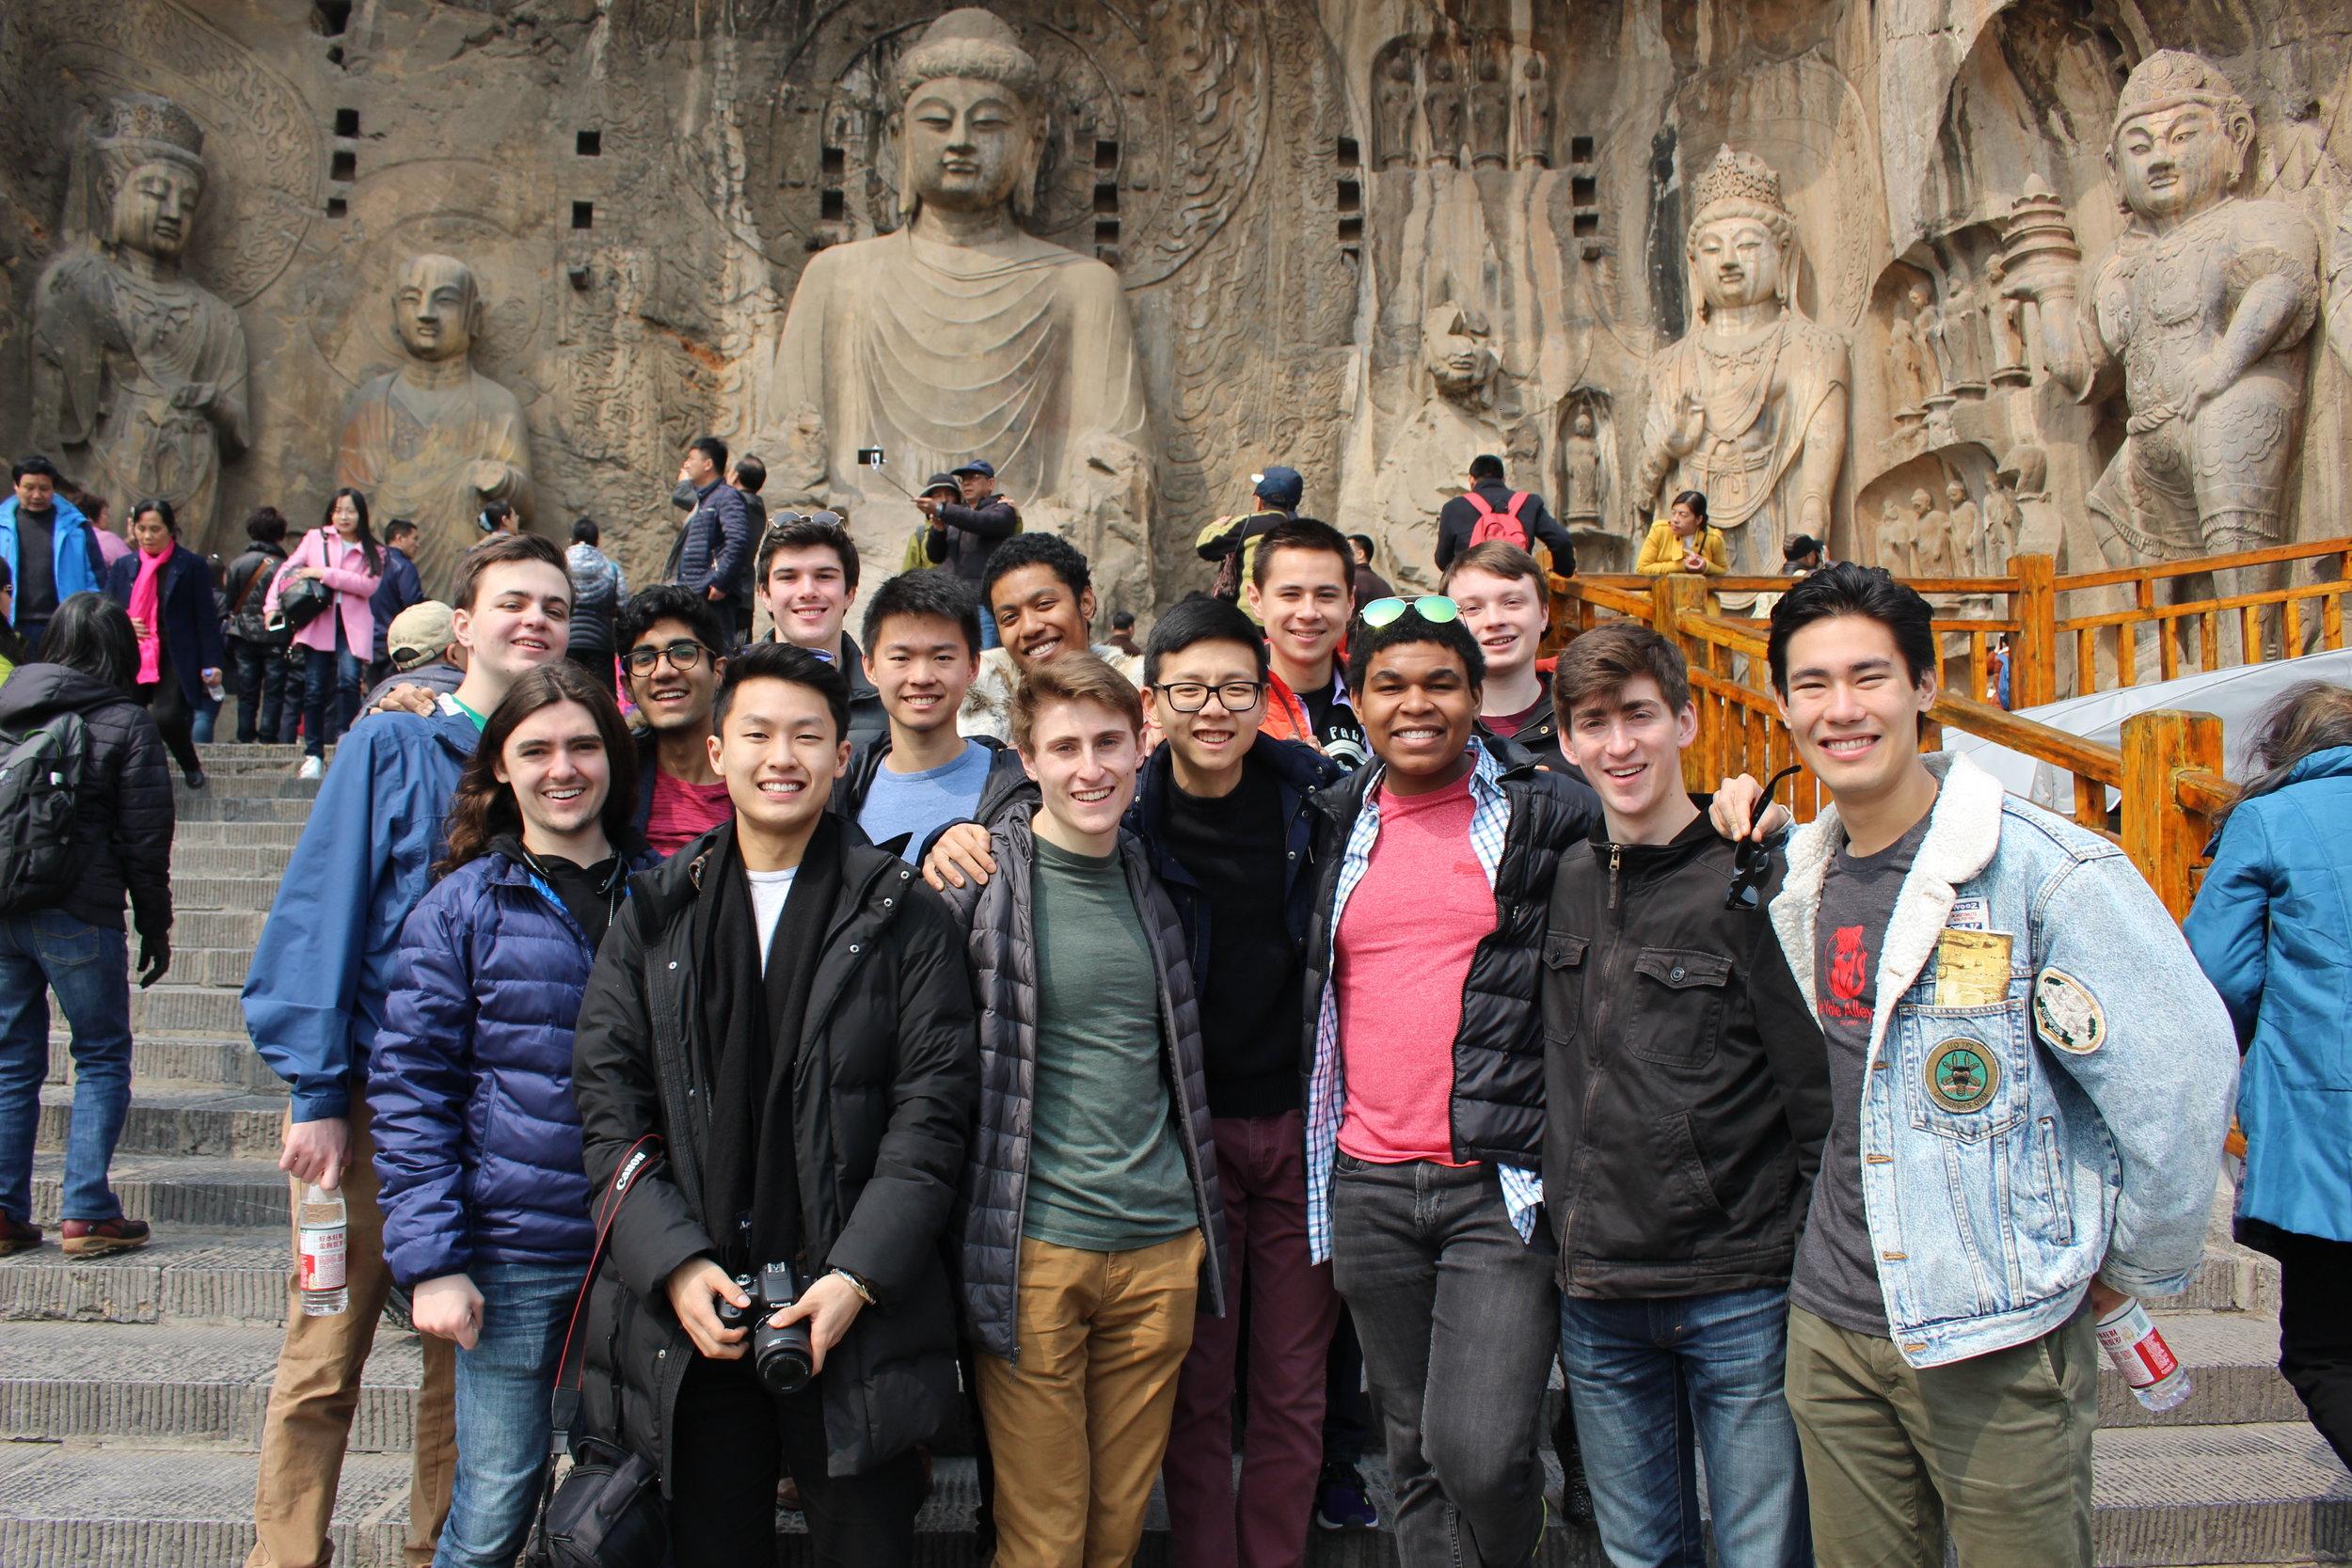 At the Longmen Grottos in Luoyang